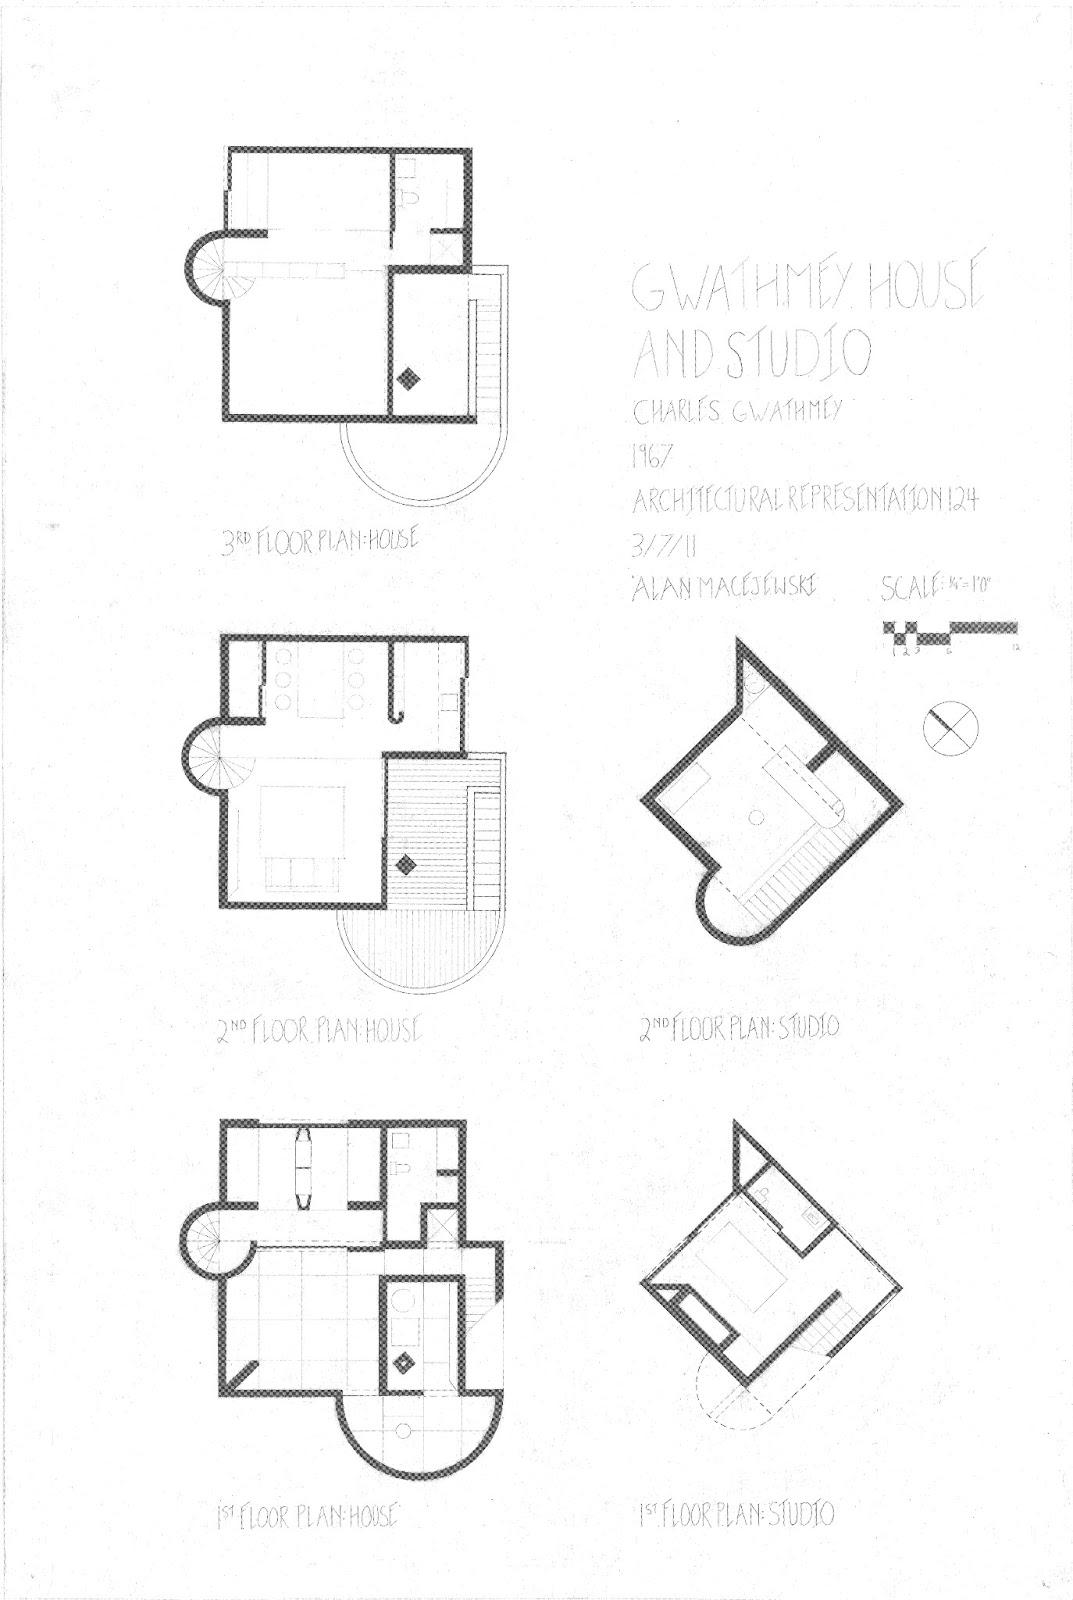 alan macejewski u0026 39 s architecture portfolio  architectural